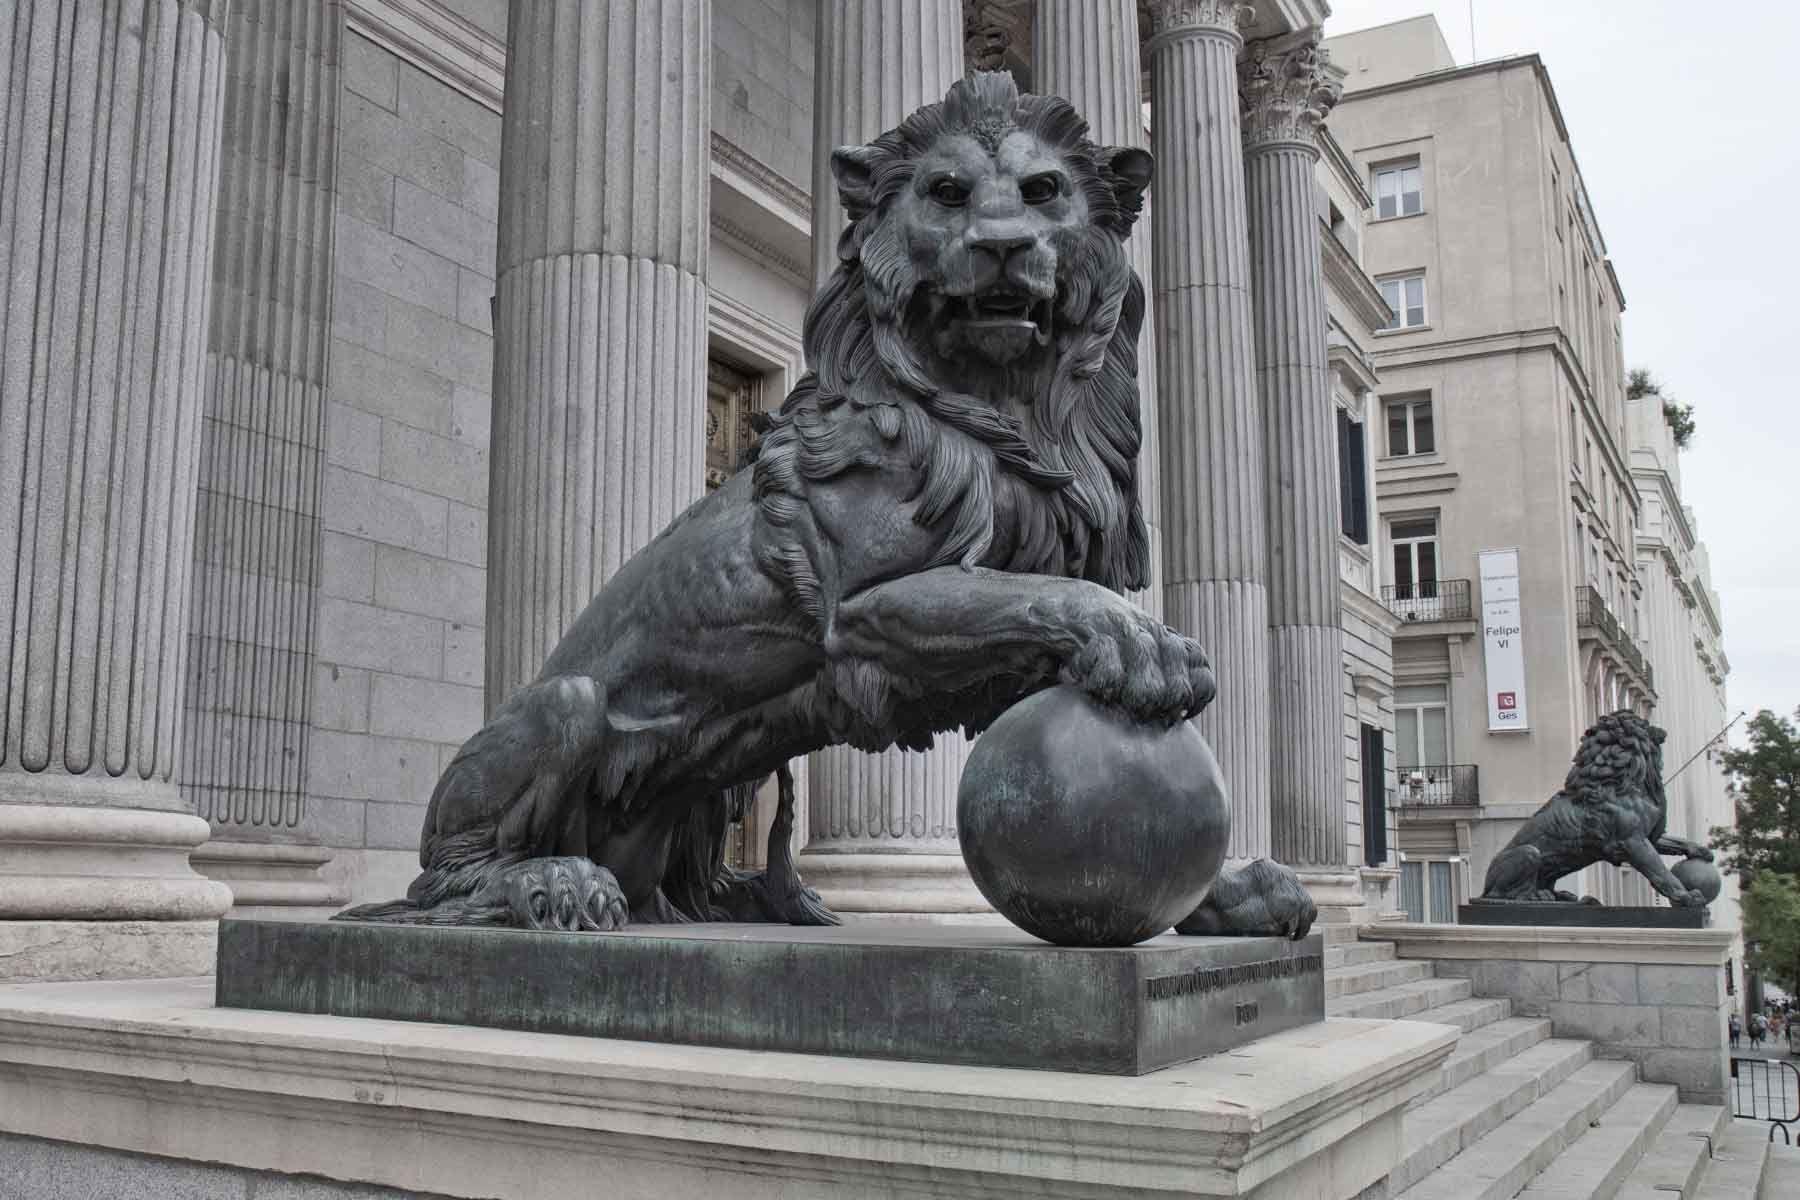 Lion statue outside congress Madrid. Google 搜索 Statue